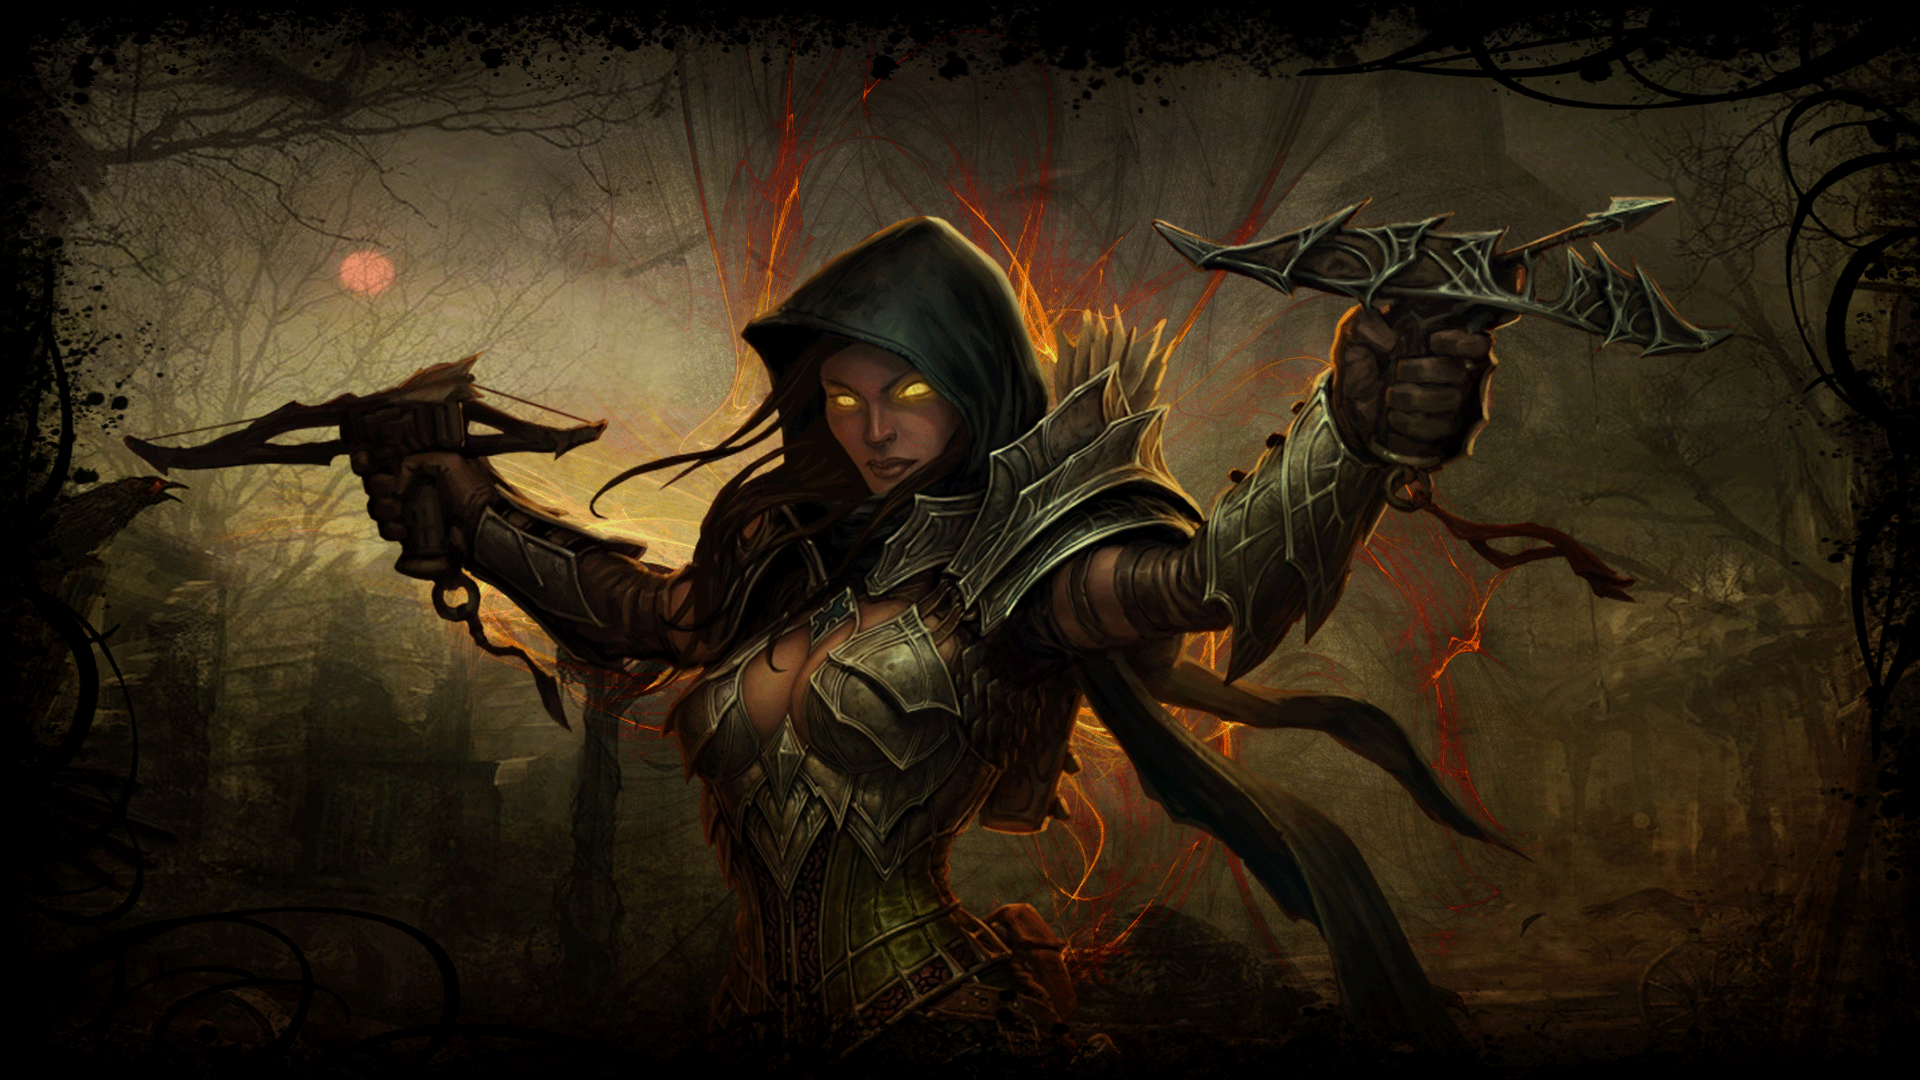 Diablo 3 Demon Hunter Background By Cursedblade1337 Deviantart